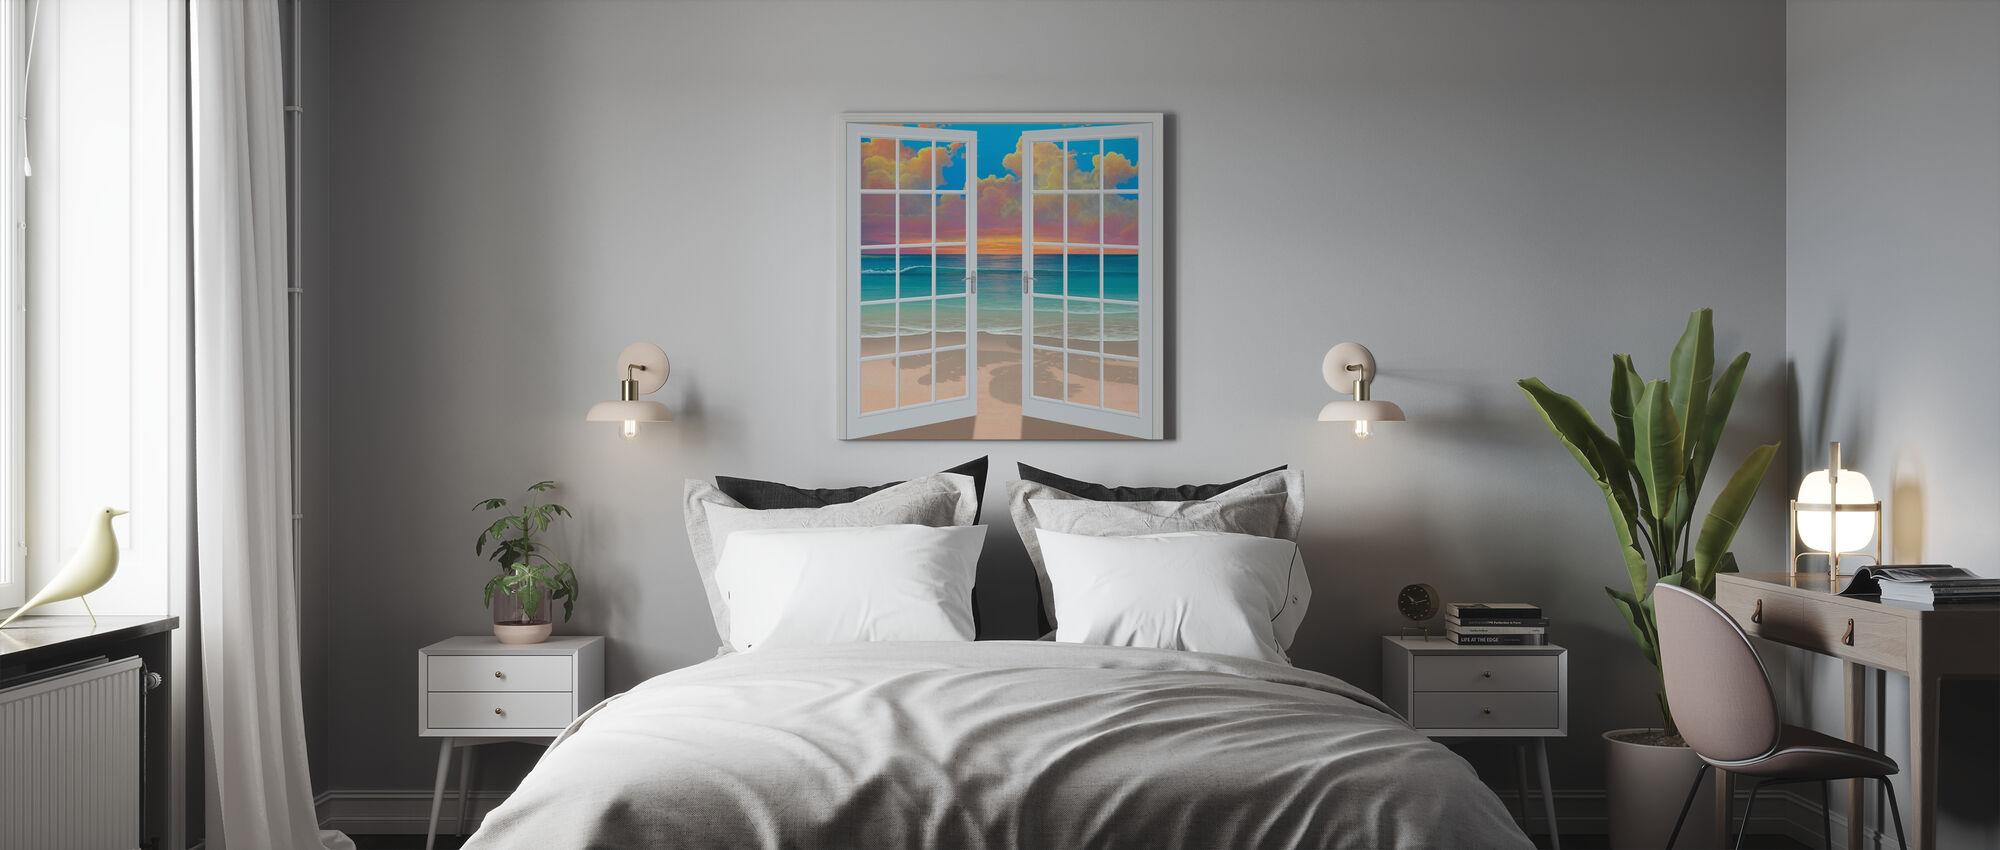 Sunset Through Window - Canvas print - Bedroom